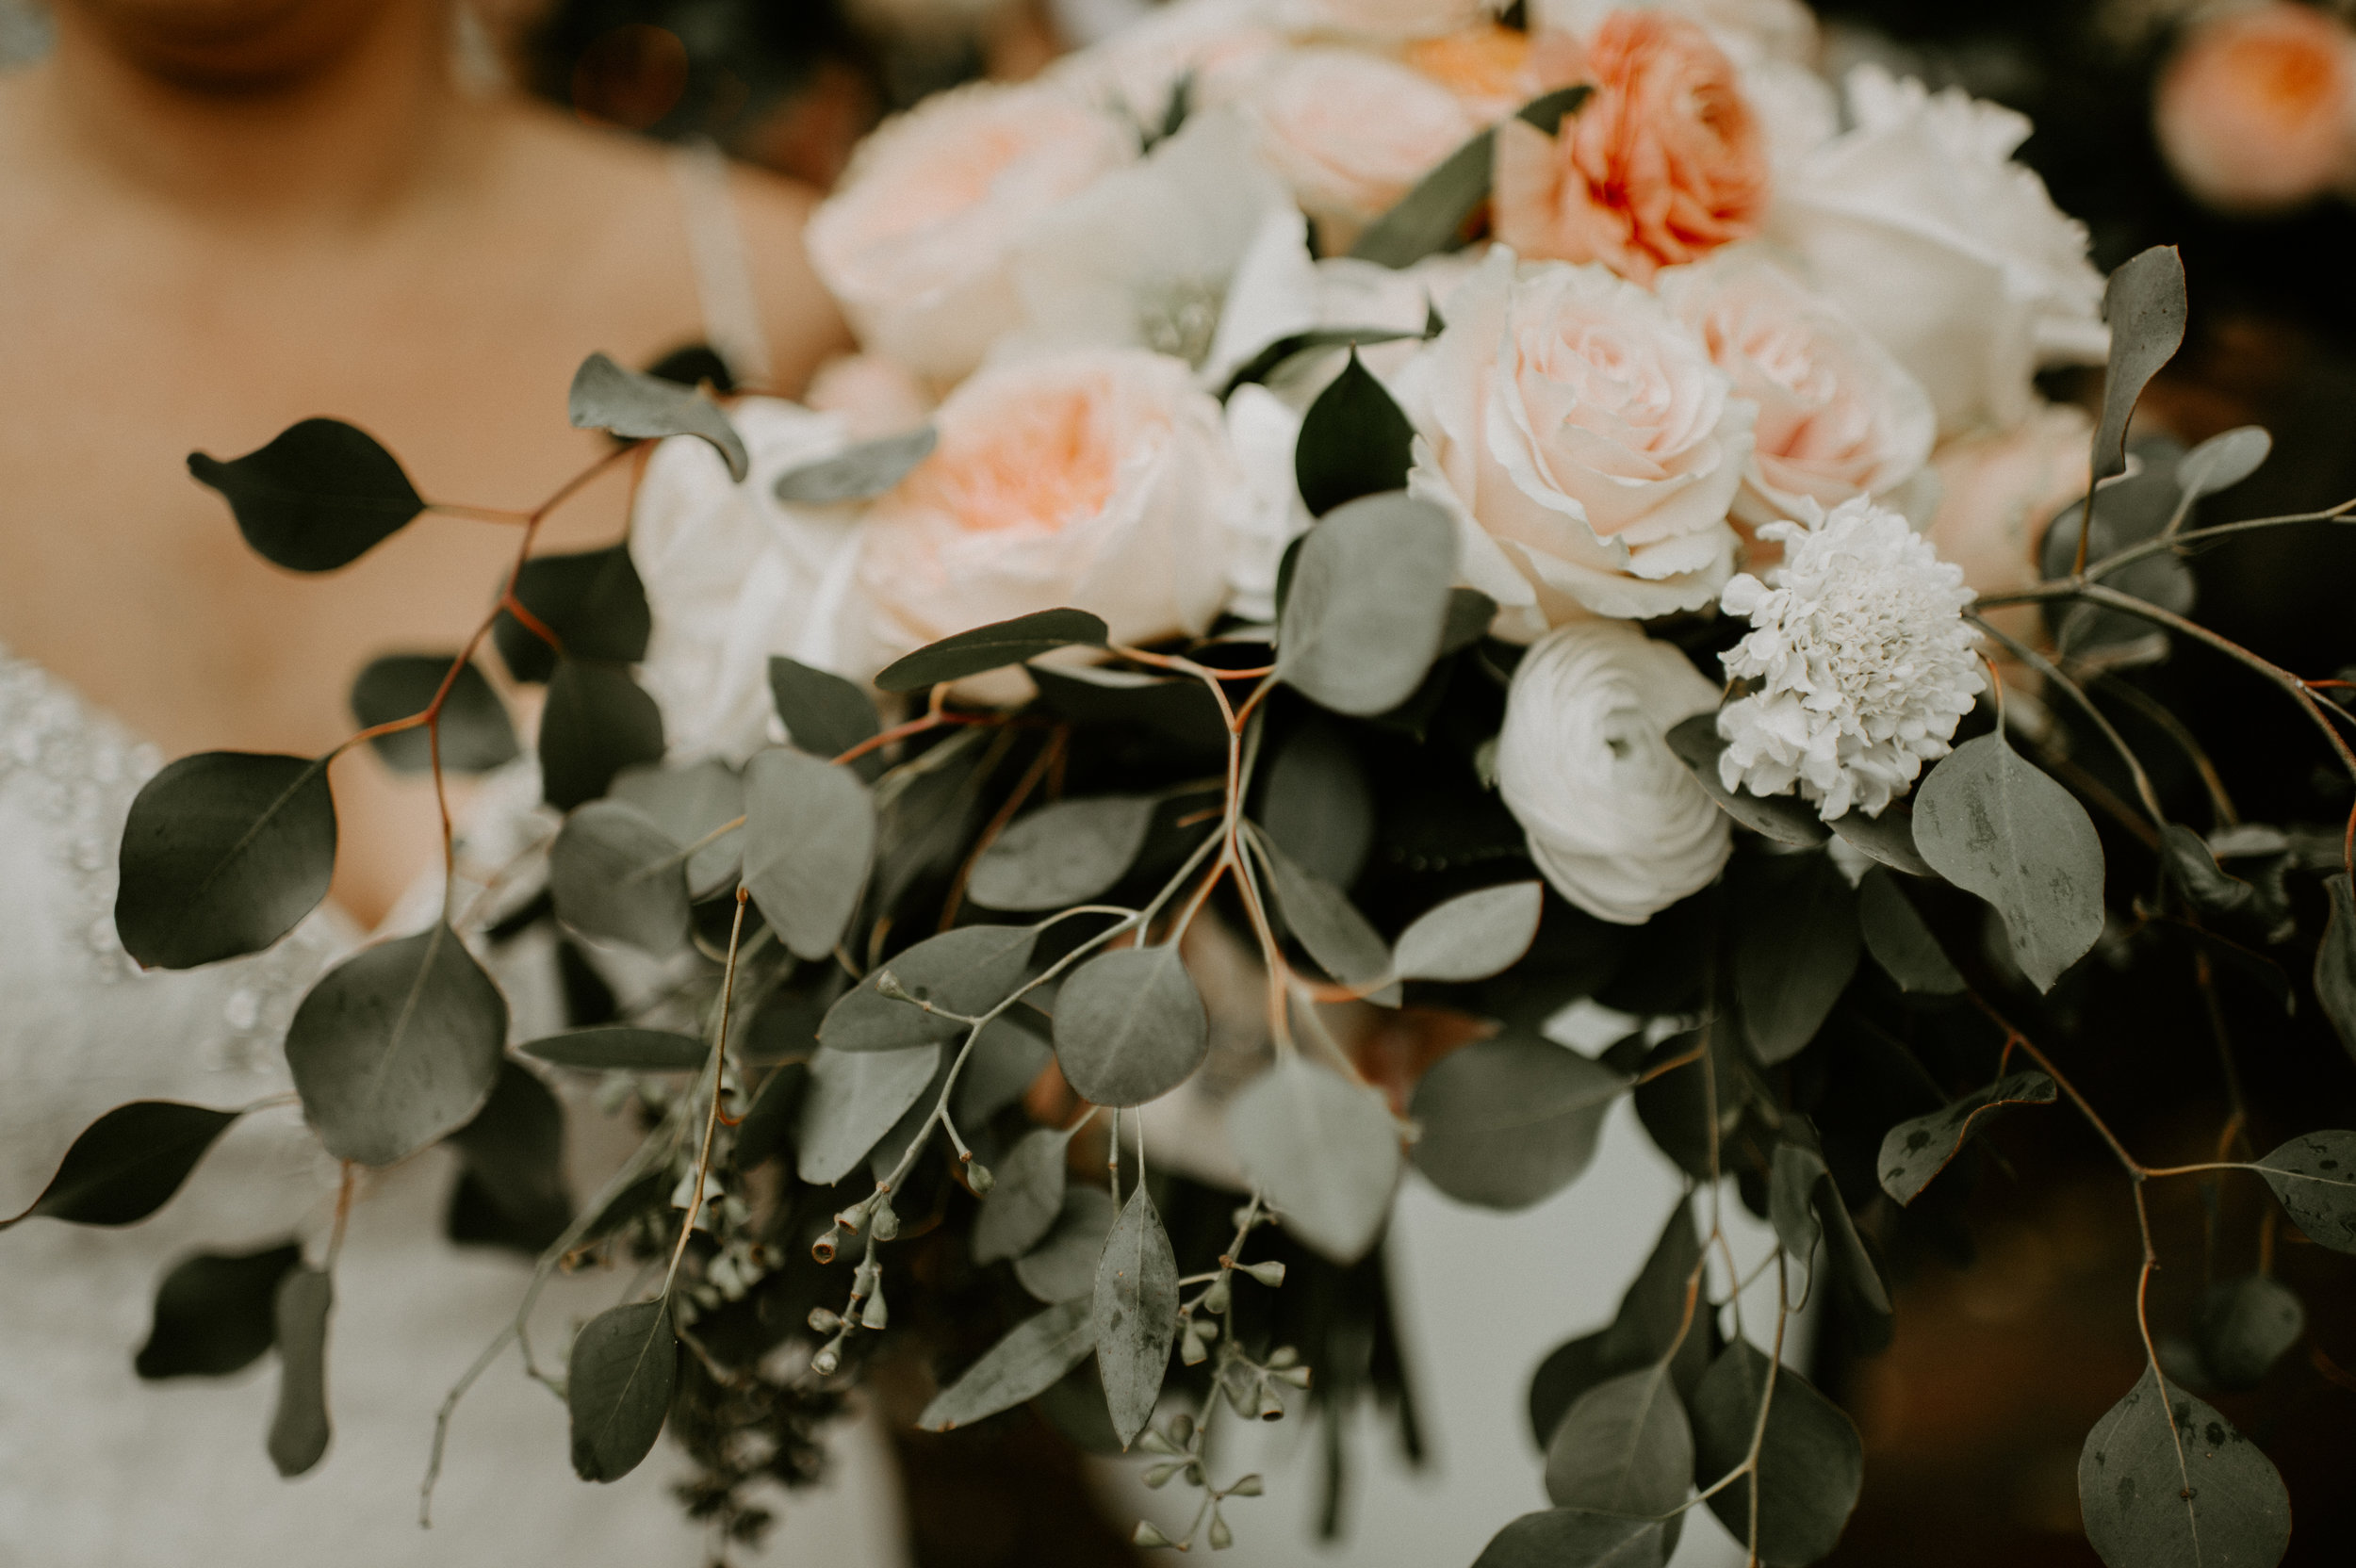 savannah-bridal-shop-andrea-and-mike-evergold-photography-georgia-state-railroad-museum-wedding-savannah-wedding-florist-savannah-wedding-planner-50.jpg